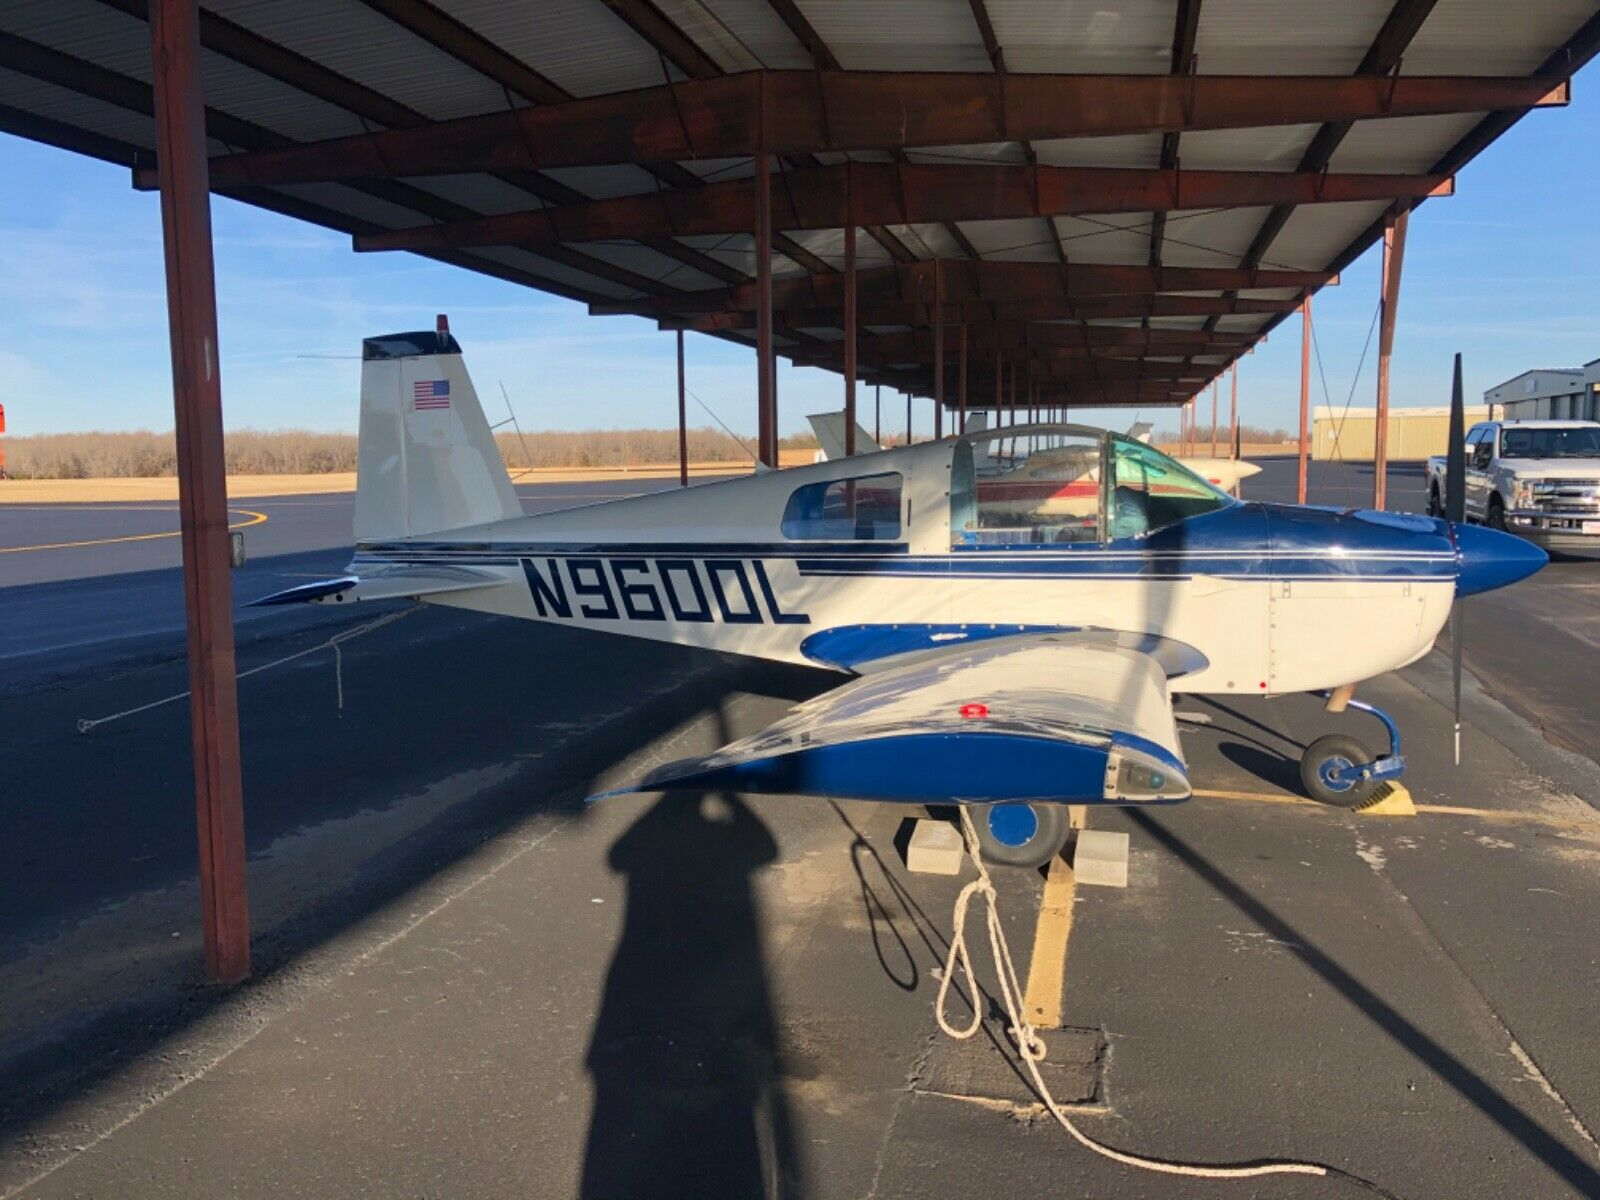 Super Low Time 1973 Grumman AA1 B aircraft